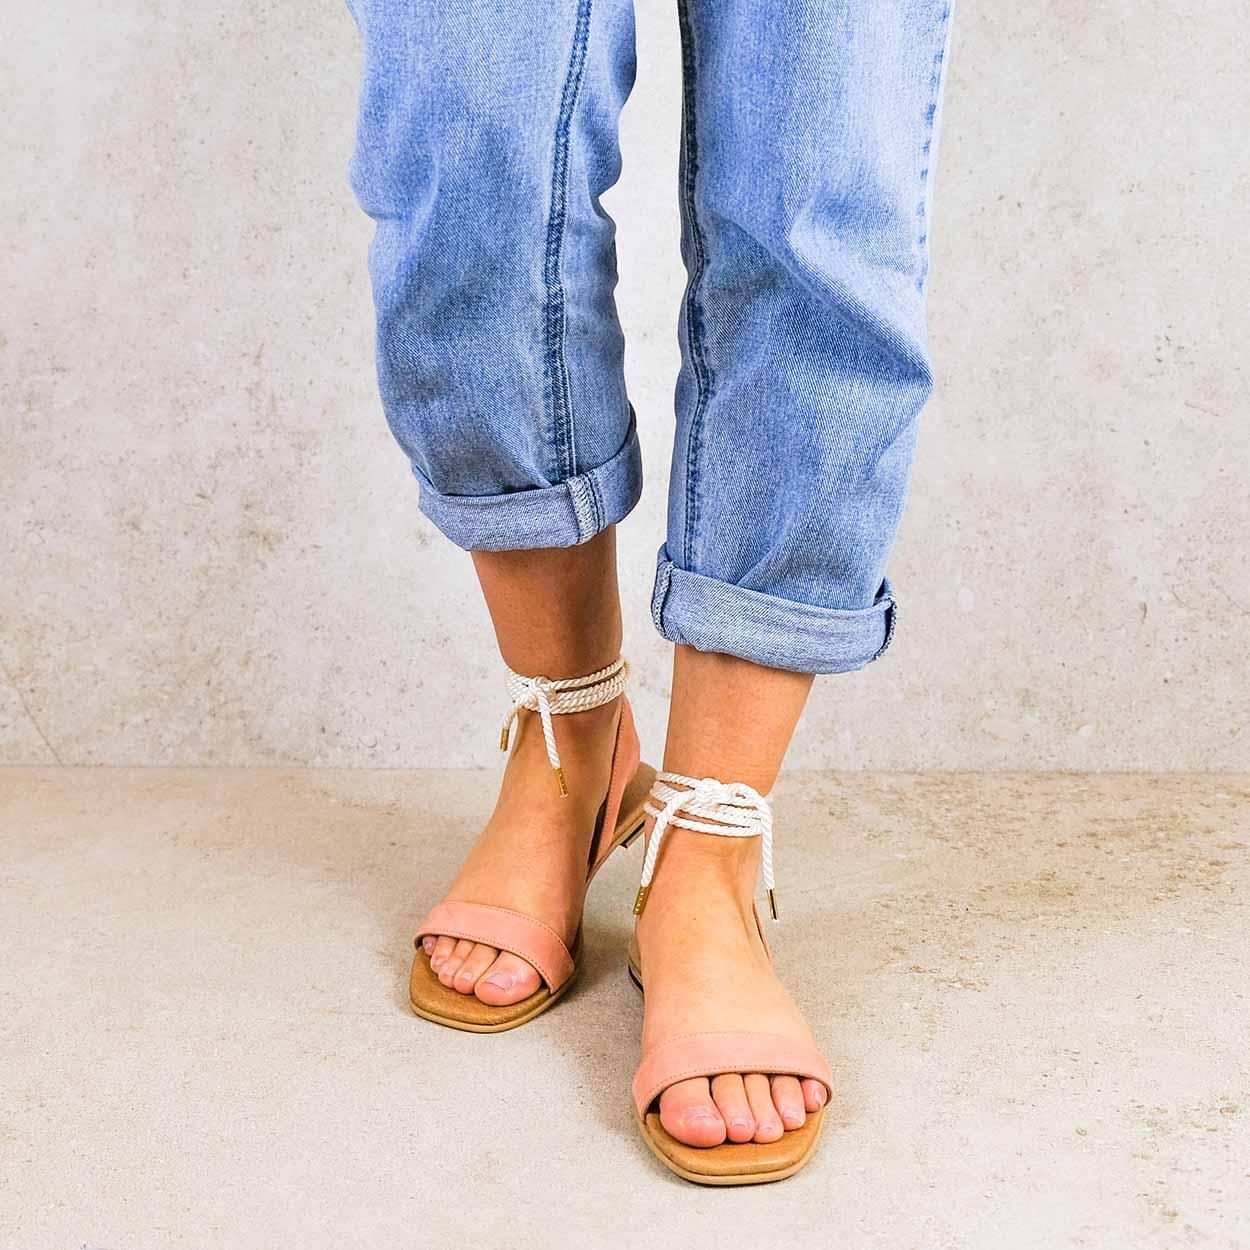 candela-apricot_lintsandalen sandals travelsandals vegan sustainable sandals wikkelsandalen